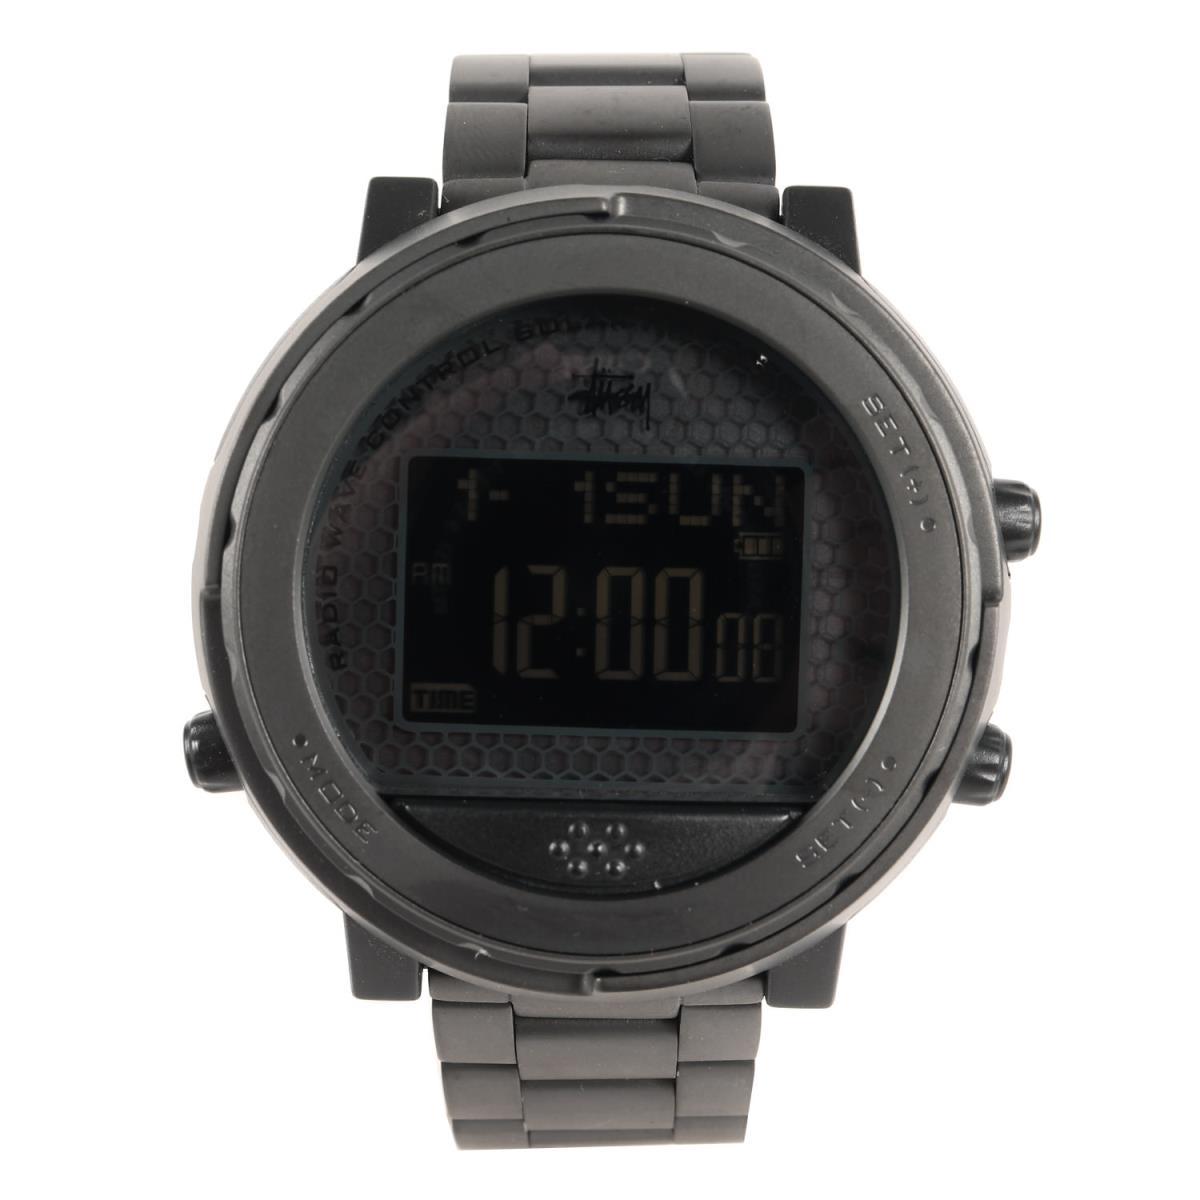 STUSSY ステューシー 時計 SEIKO WIRED h ソーラー 電波 デジタル 腕時計 ウォッチ ブラック 【メンズ】【中古】【美品】【K2717】